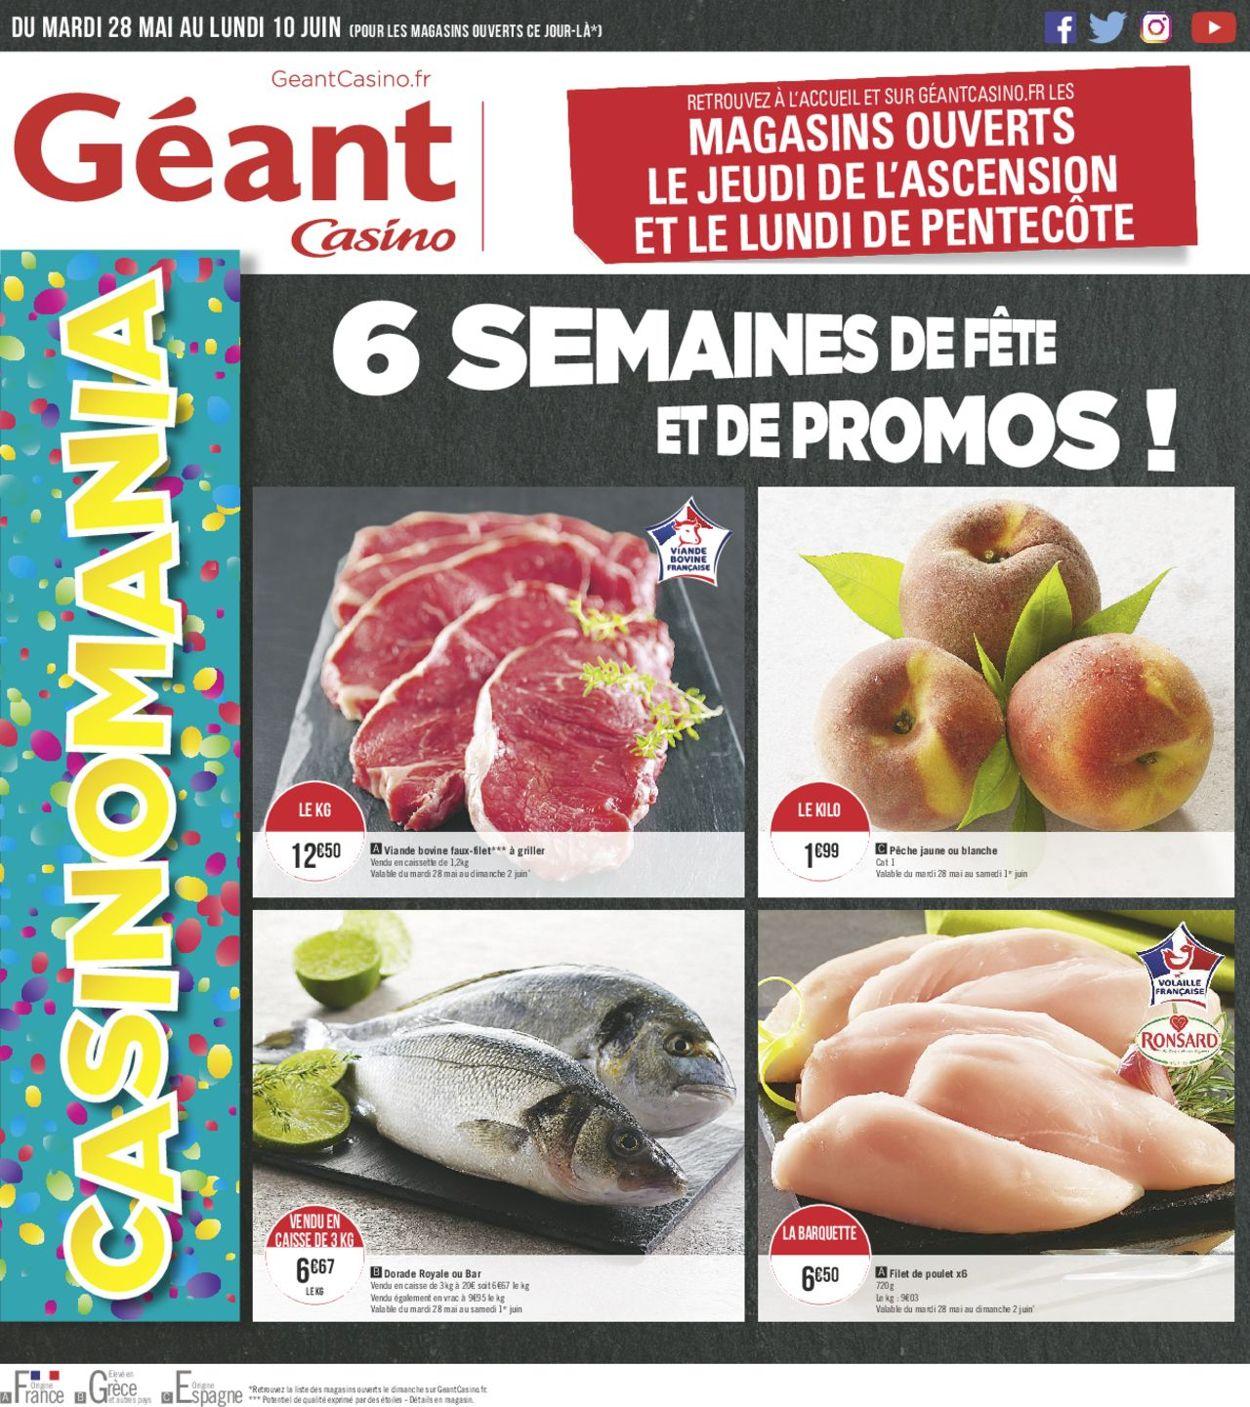 Géant Casino Catalogue - 28.05-10.06.2019